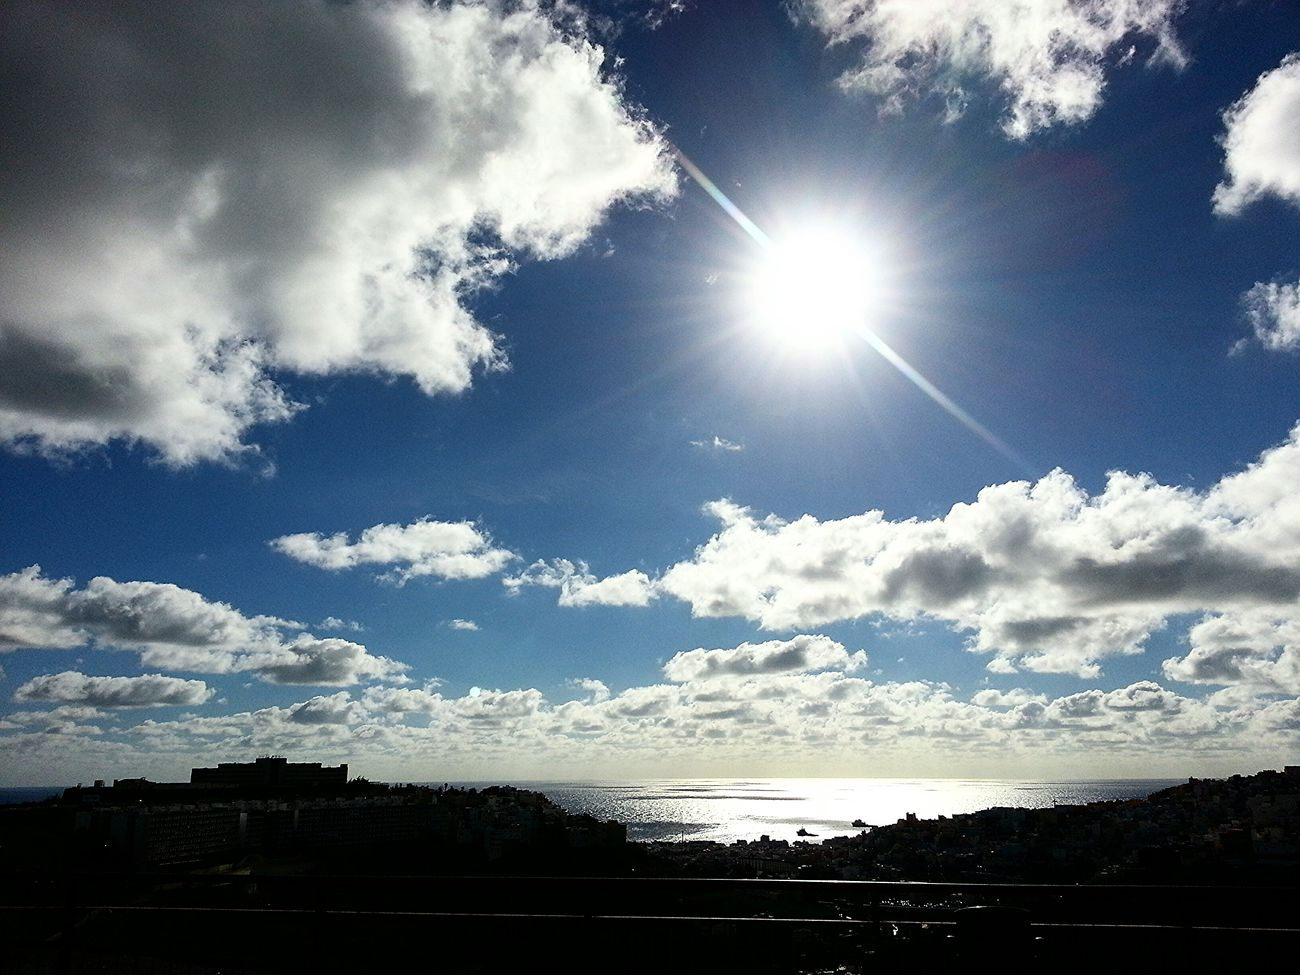 The great mirror of the sun. We Are Photography, We Are EyeEm Skyporn Cloudporn ...Rincones De Las Palmas ModernA...